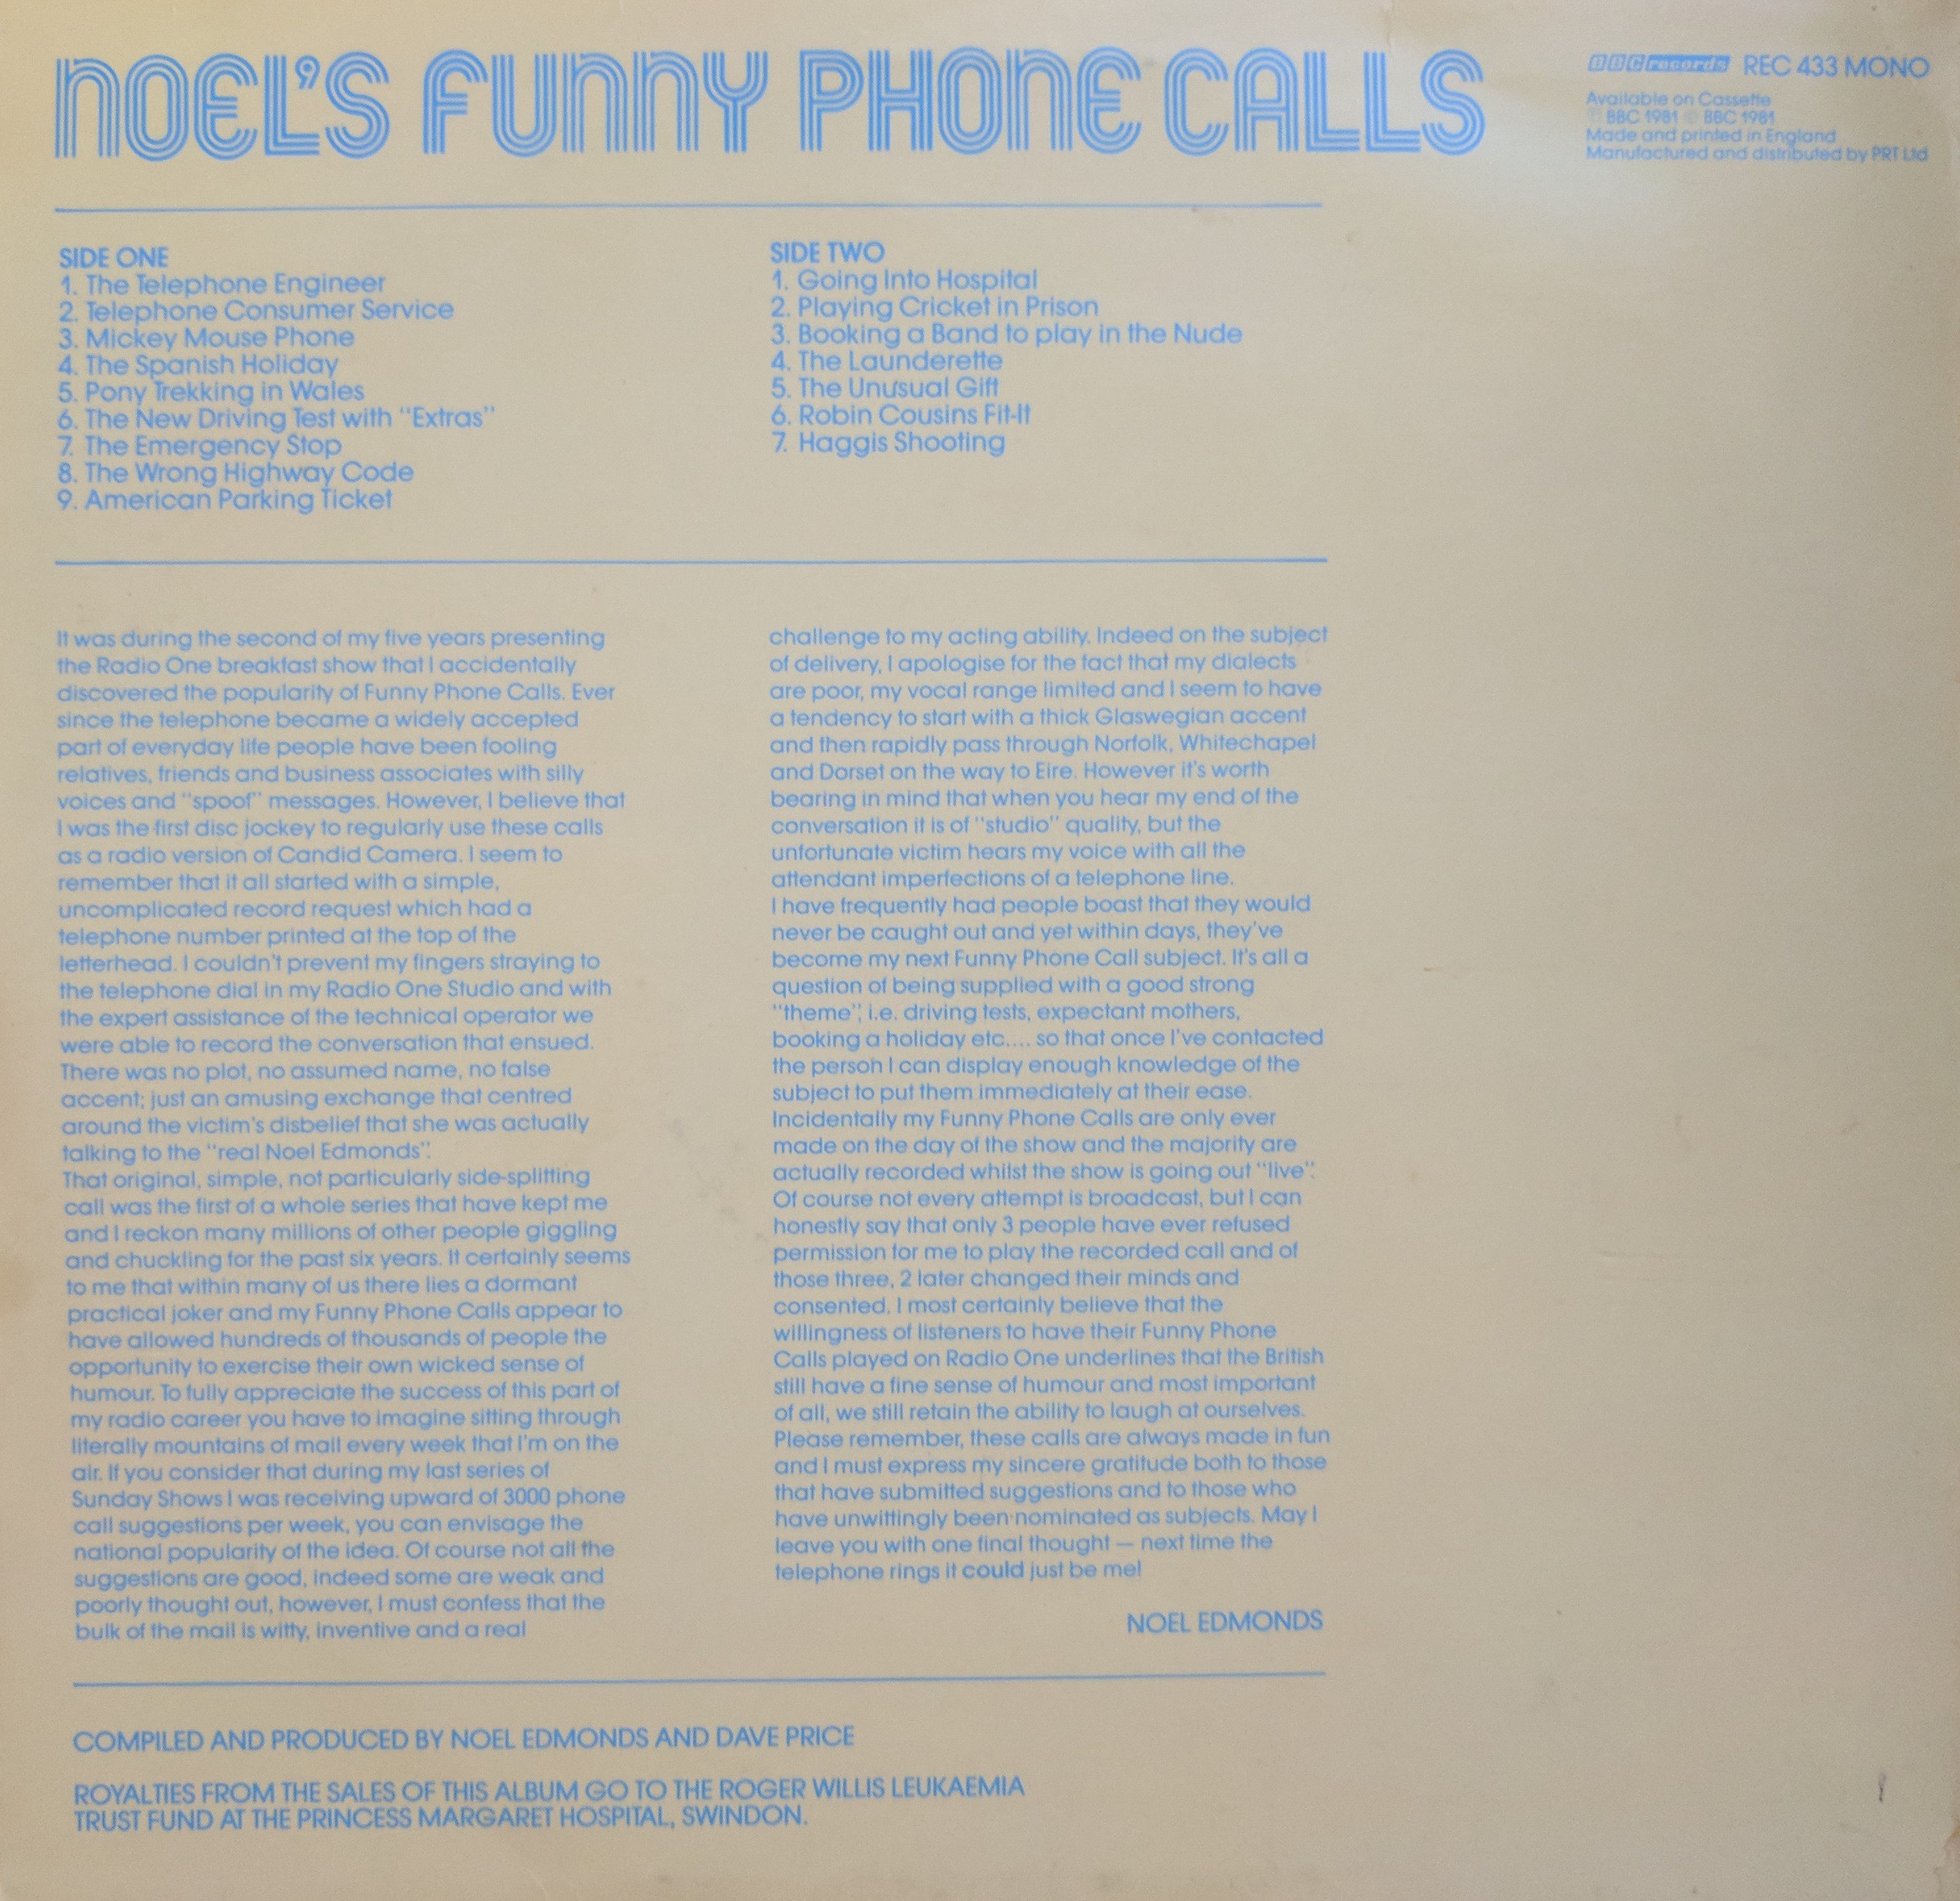 Noels Funny Phone Calls (Back)